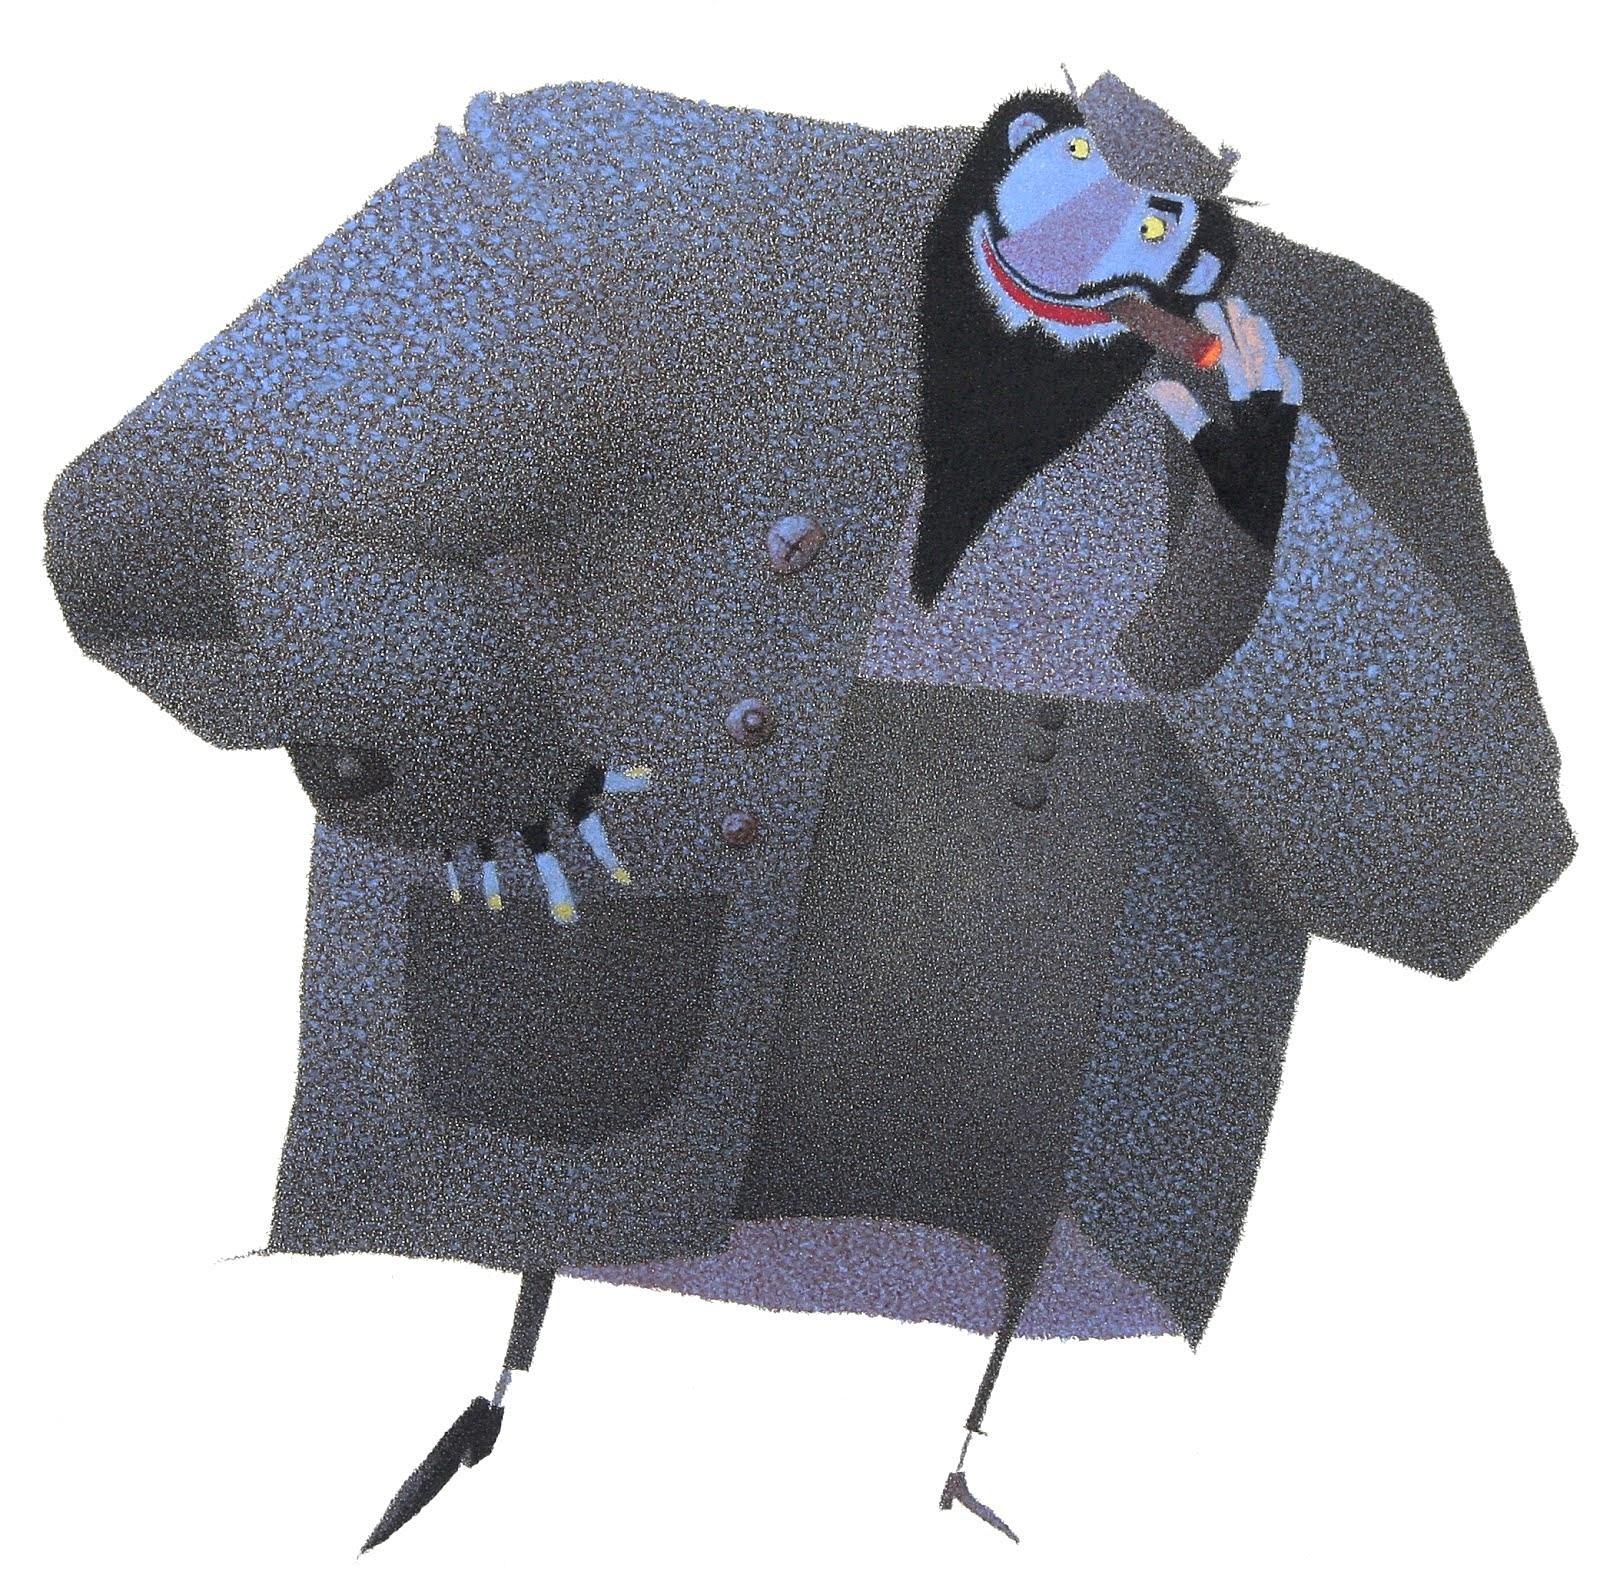 052-paranorman-concept-art-character-design-Mr._Prenderghast.jpg